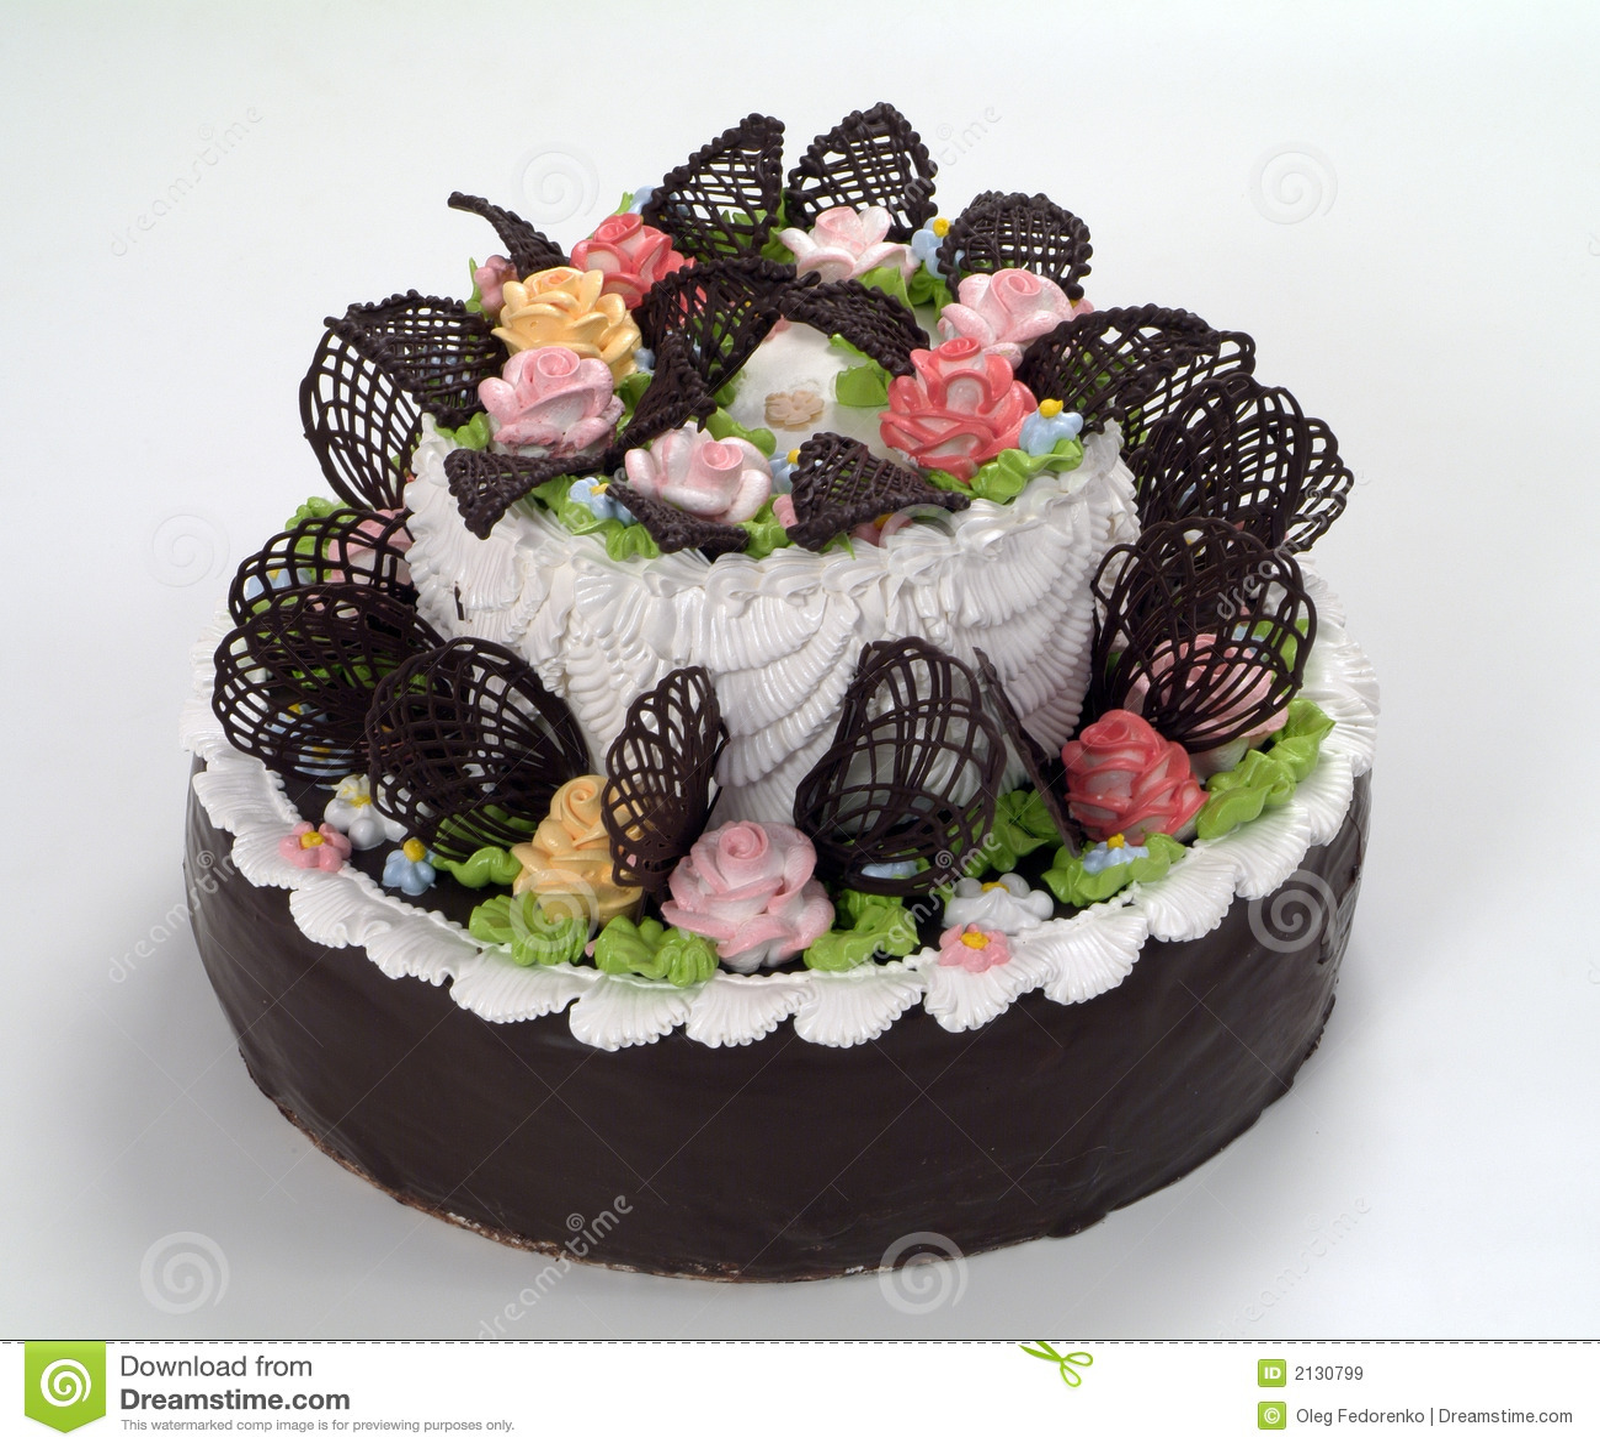 Pastries Cake Tasty Sweet Stock Image Image Of